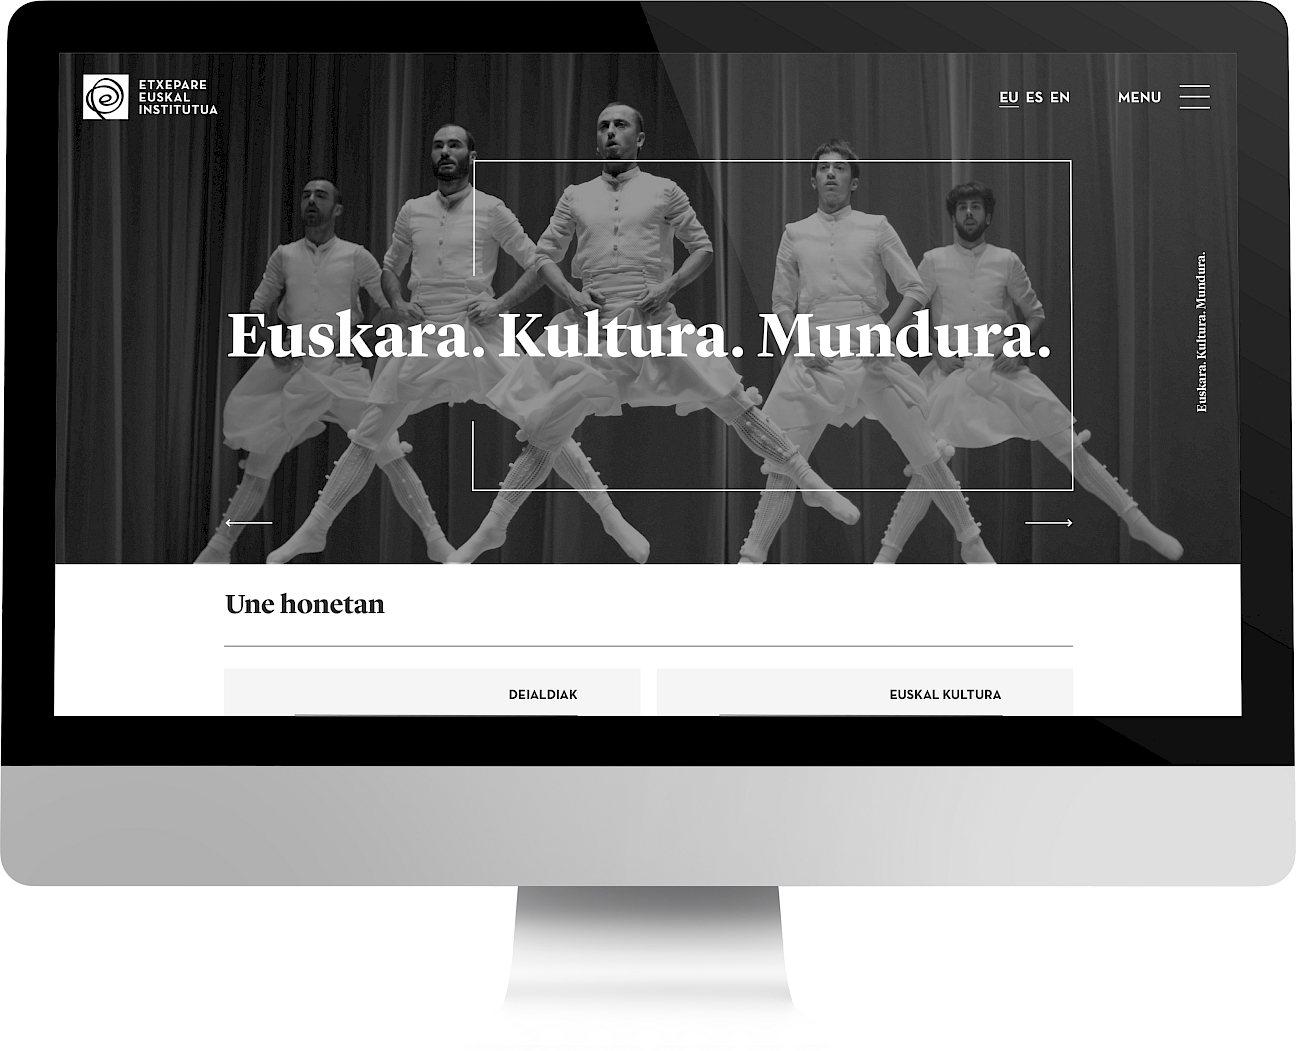 branding move etxepare narrative design 01 digital website spaces 1